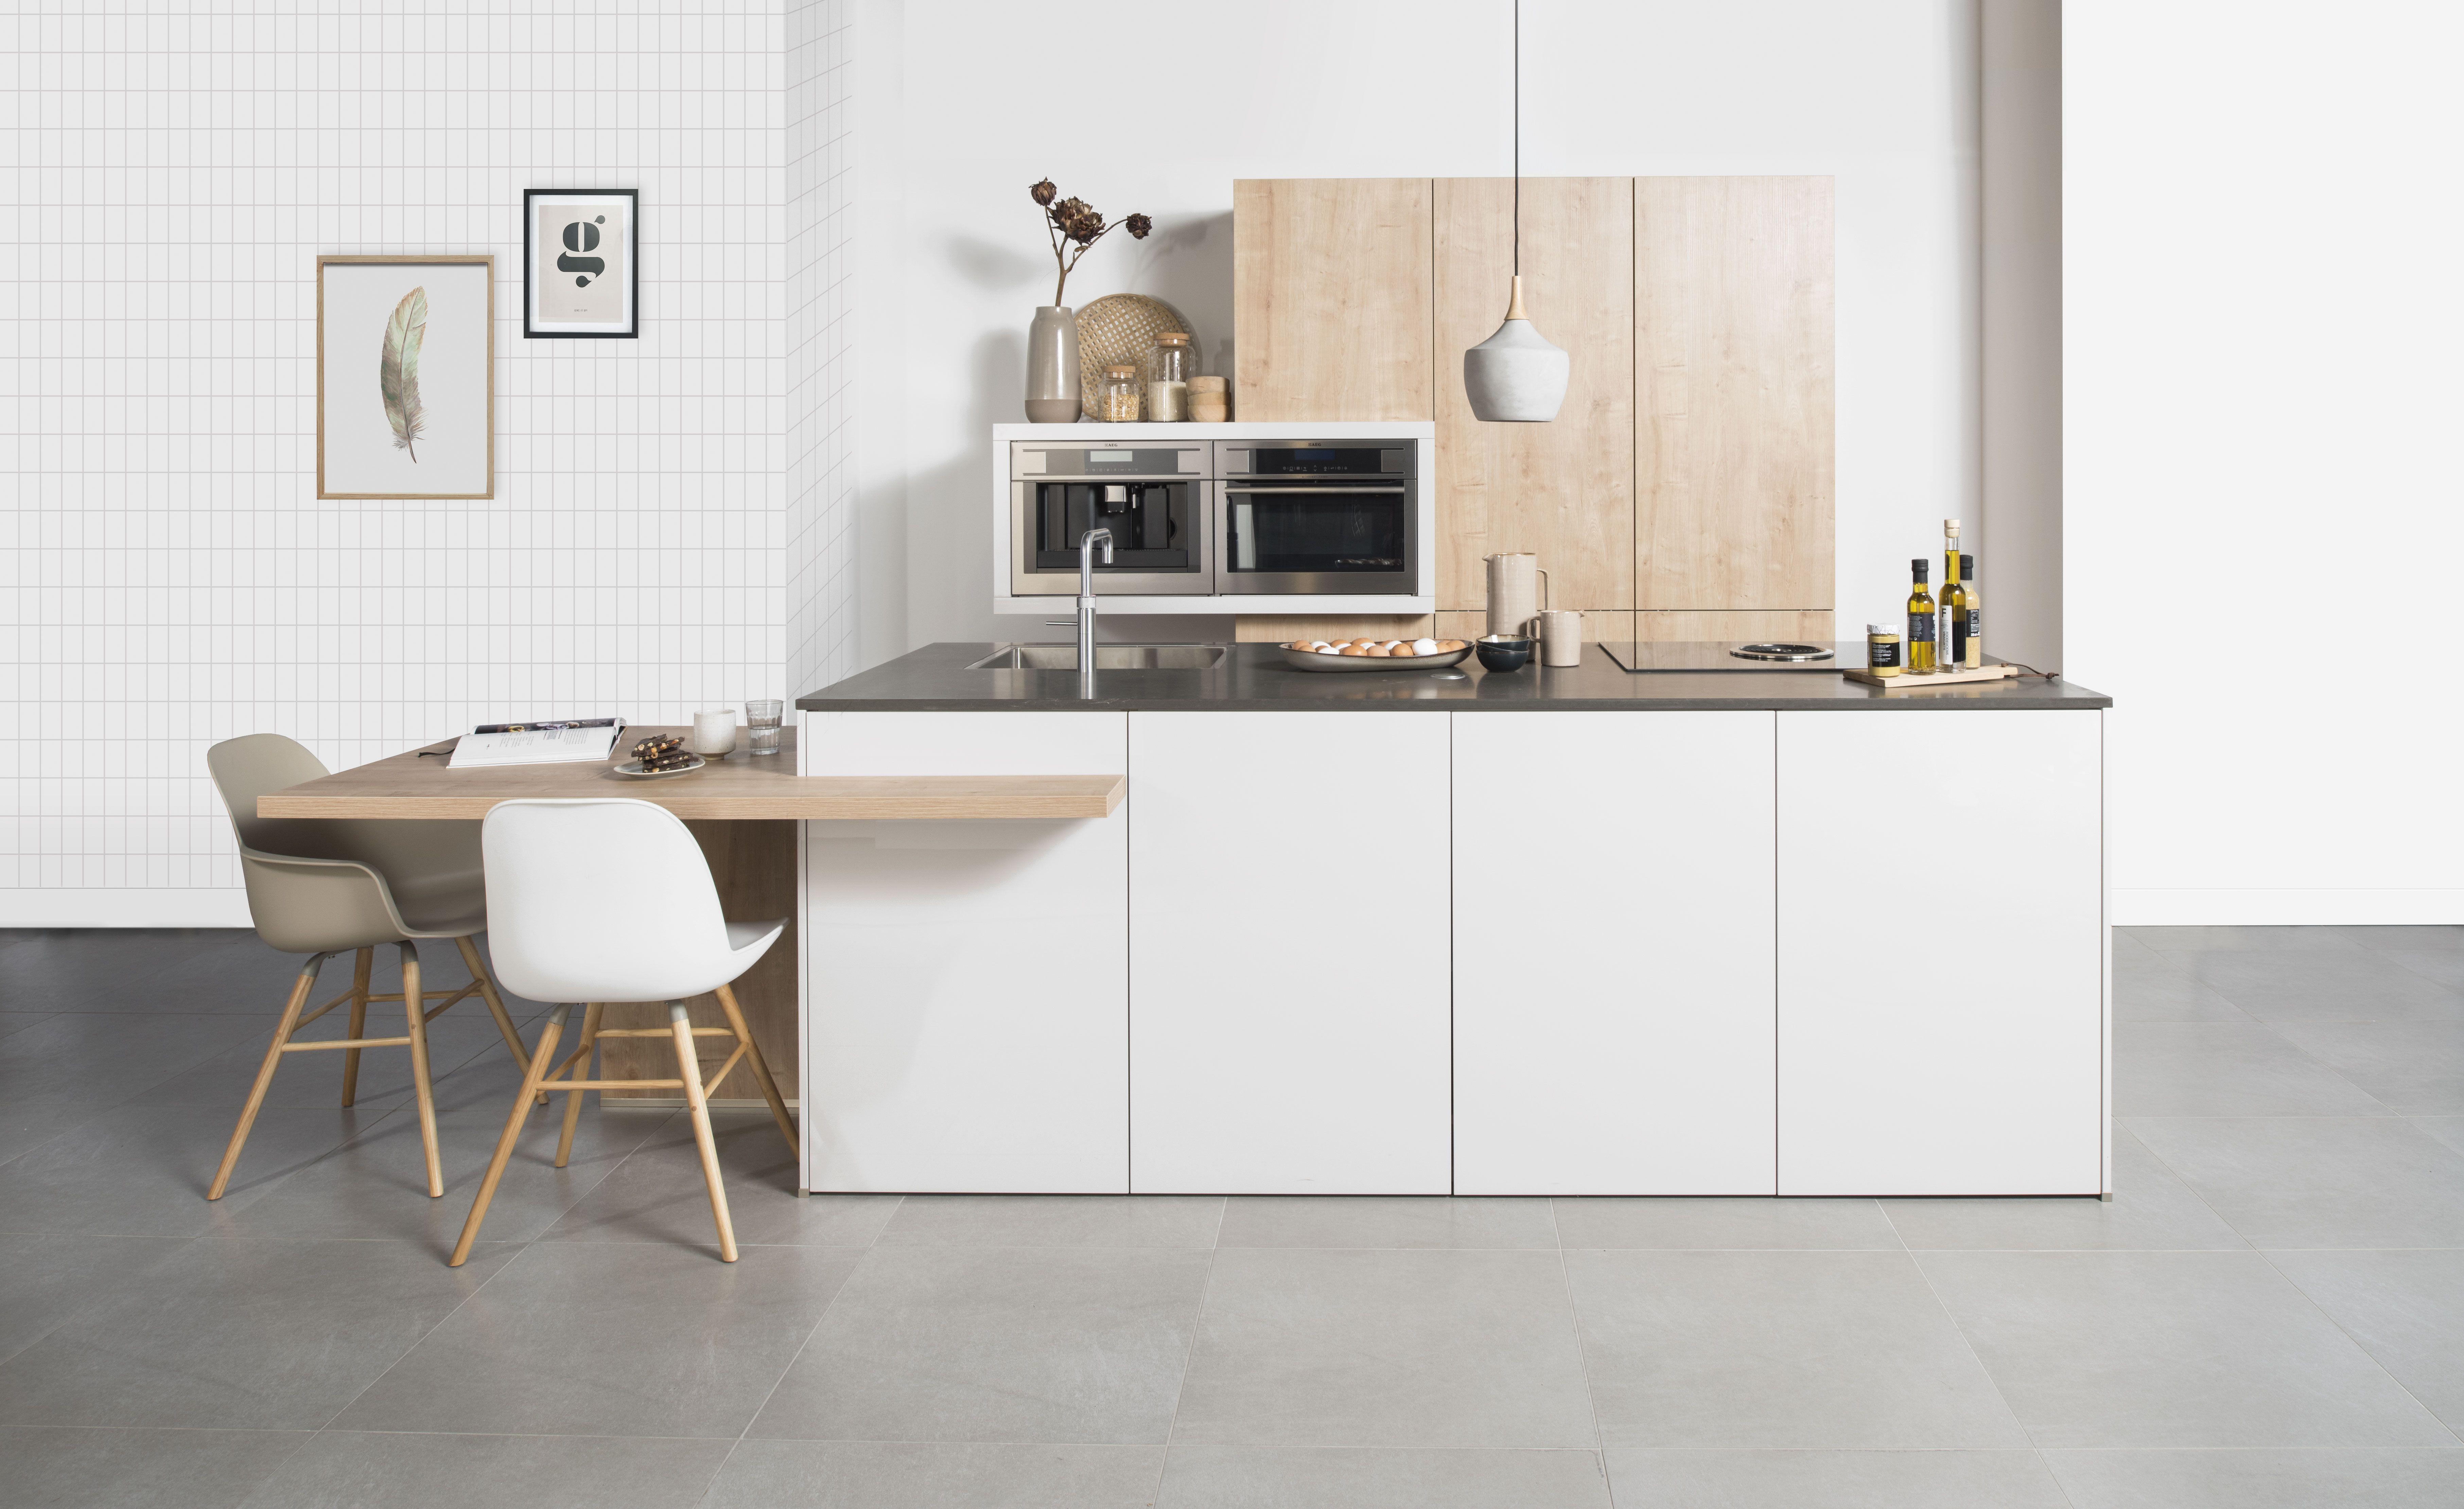 Kastjes Open Keuken : Keukenwerkplaats b met werkbank en houten kasten